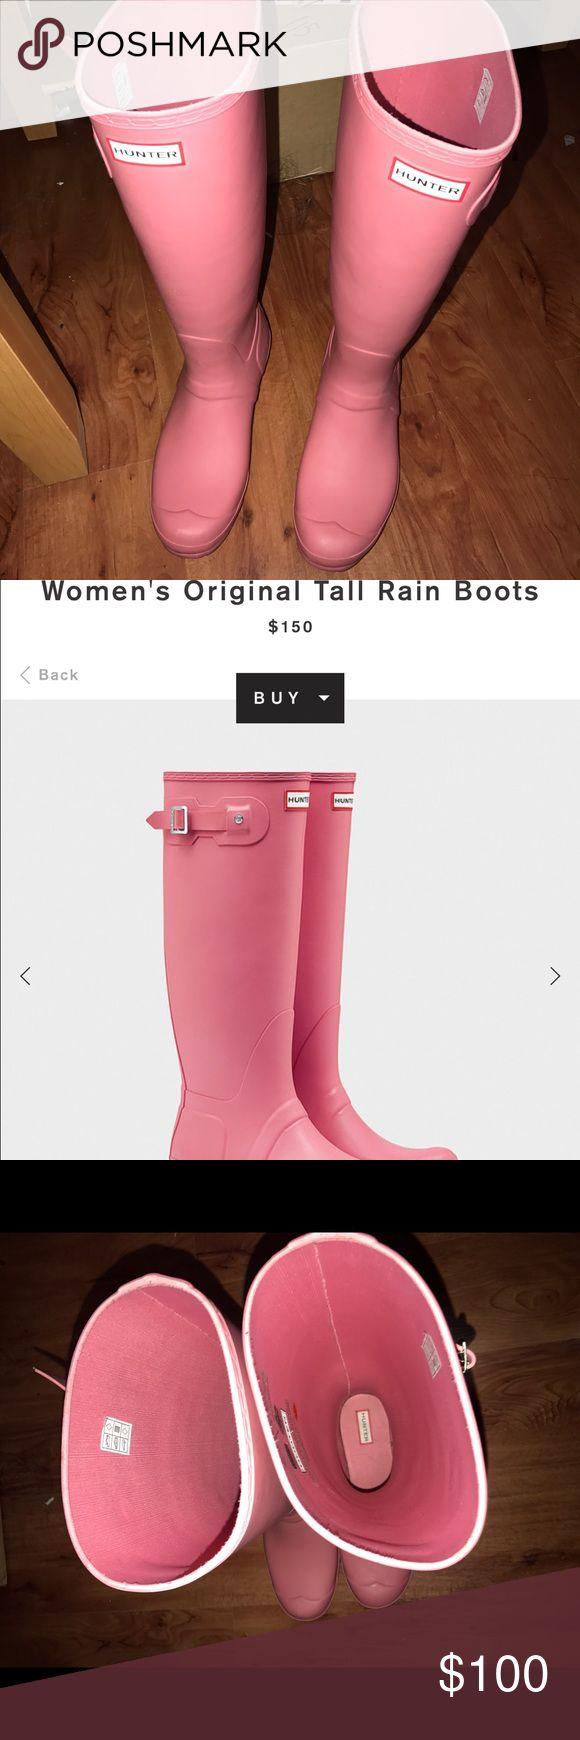 Women's tall hunter rain boots Size 10 hunter rain boots, good condition, only worn twice! Hunter Boots Shoes Winter & Rain Boots